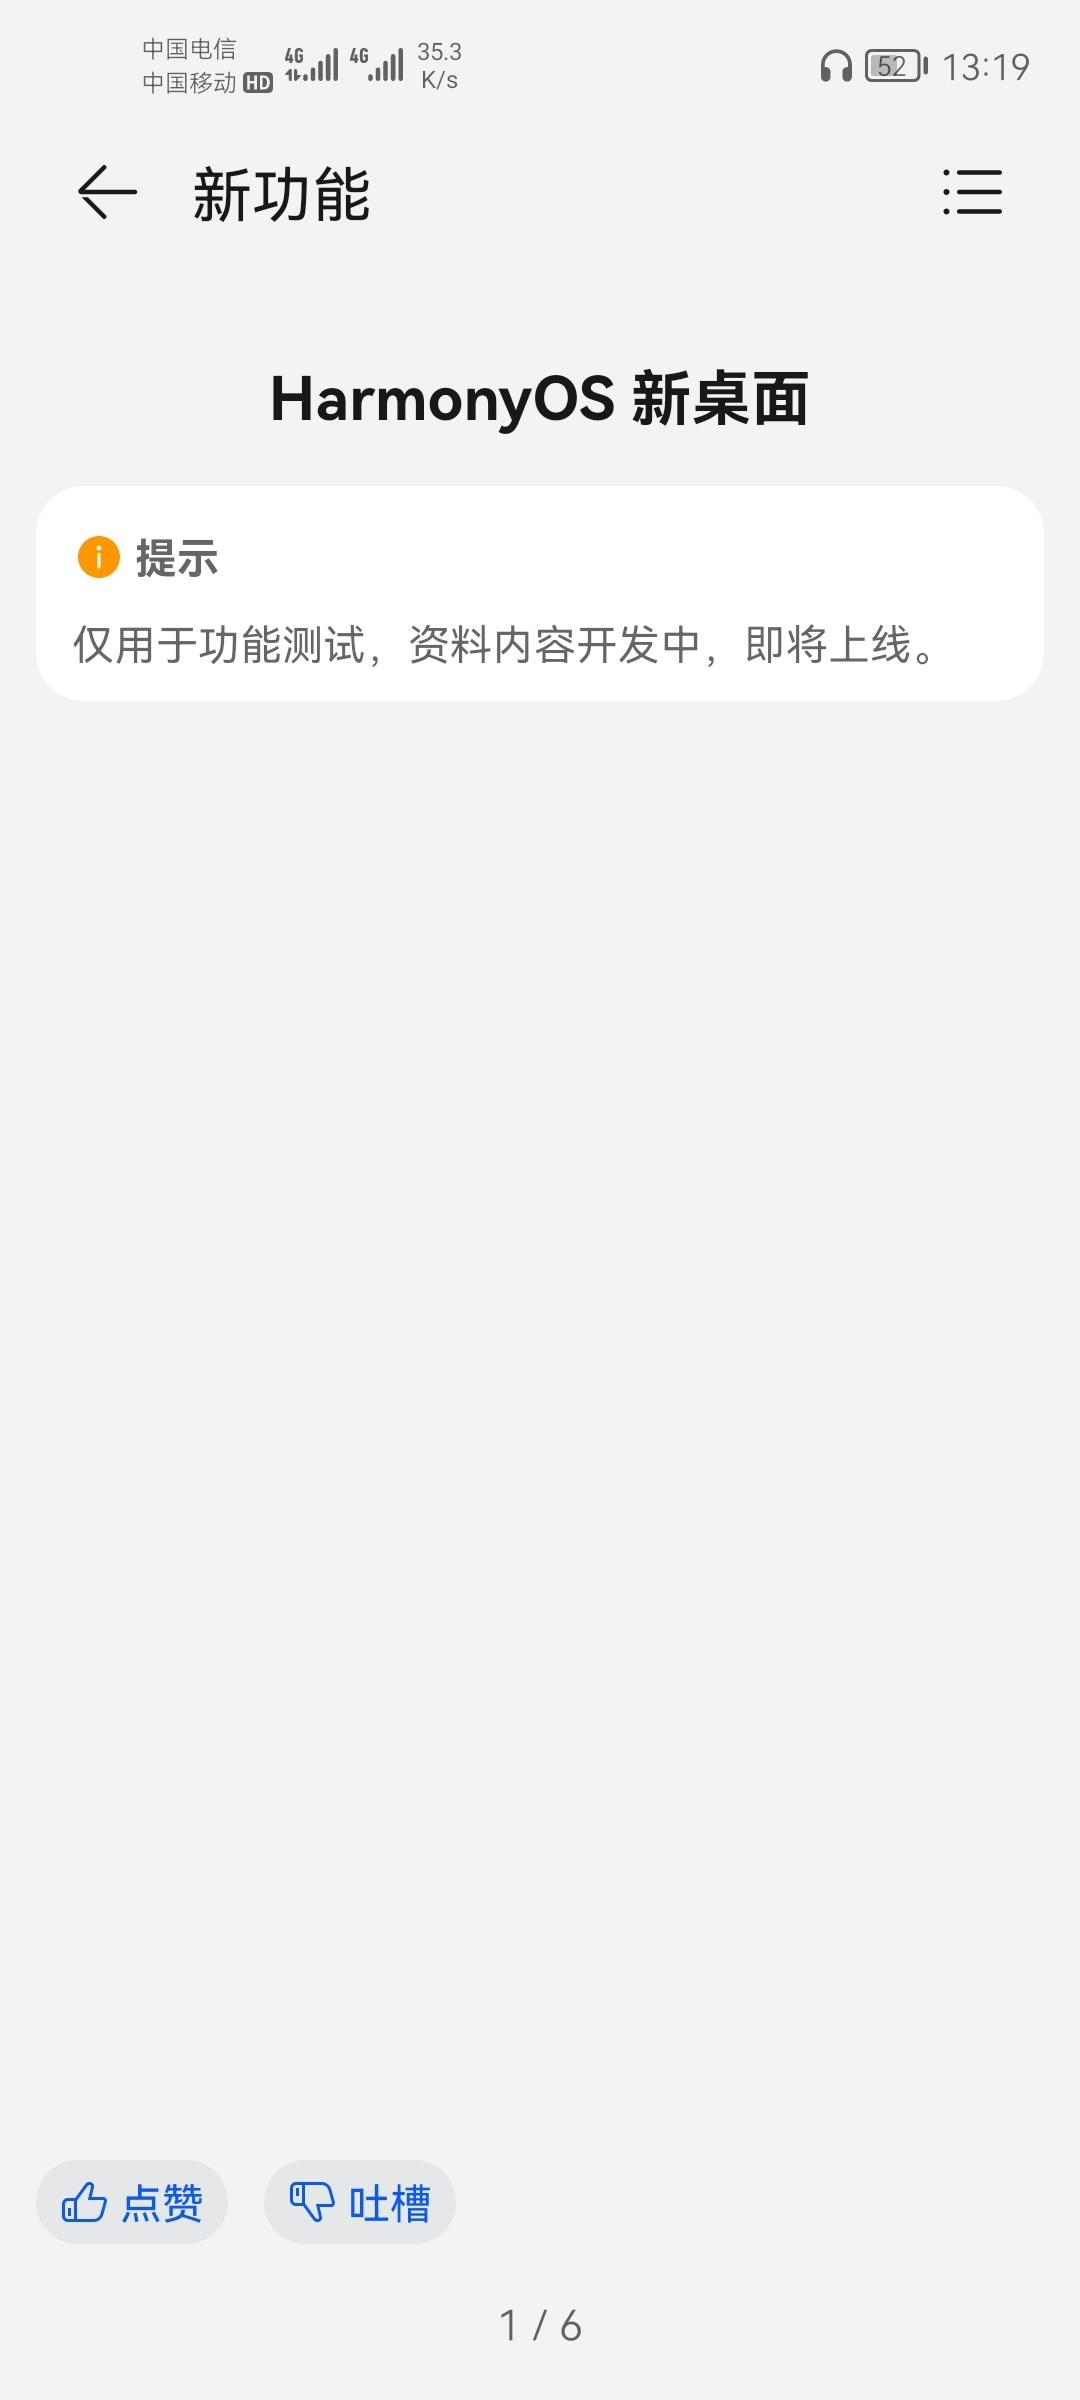 Screenshot_20210611_131937_com.huawei.android.tips.jpg